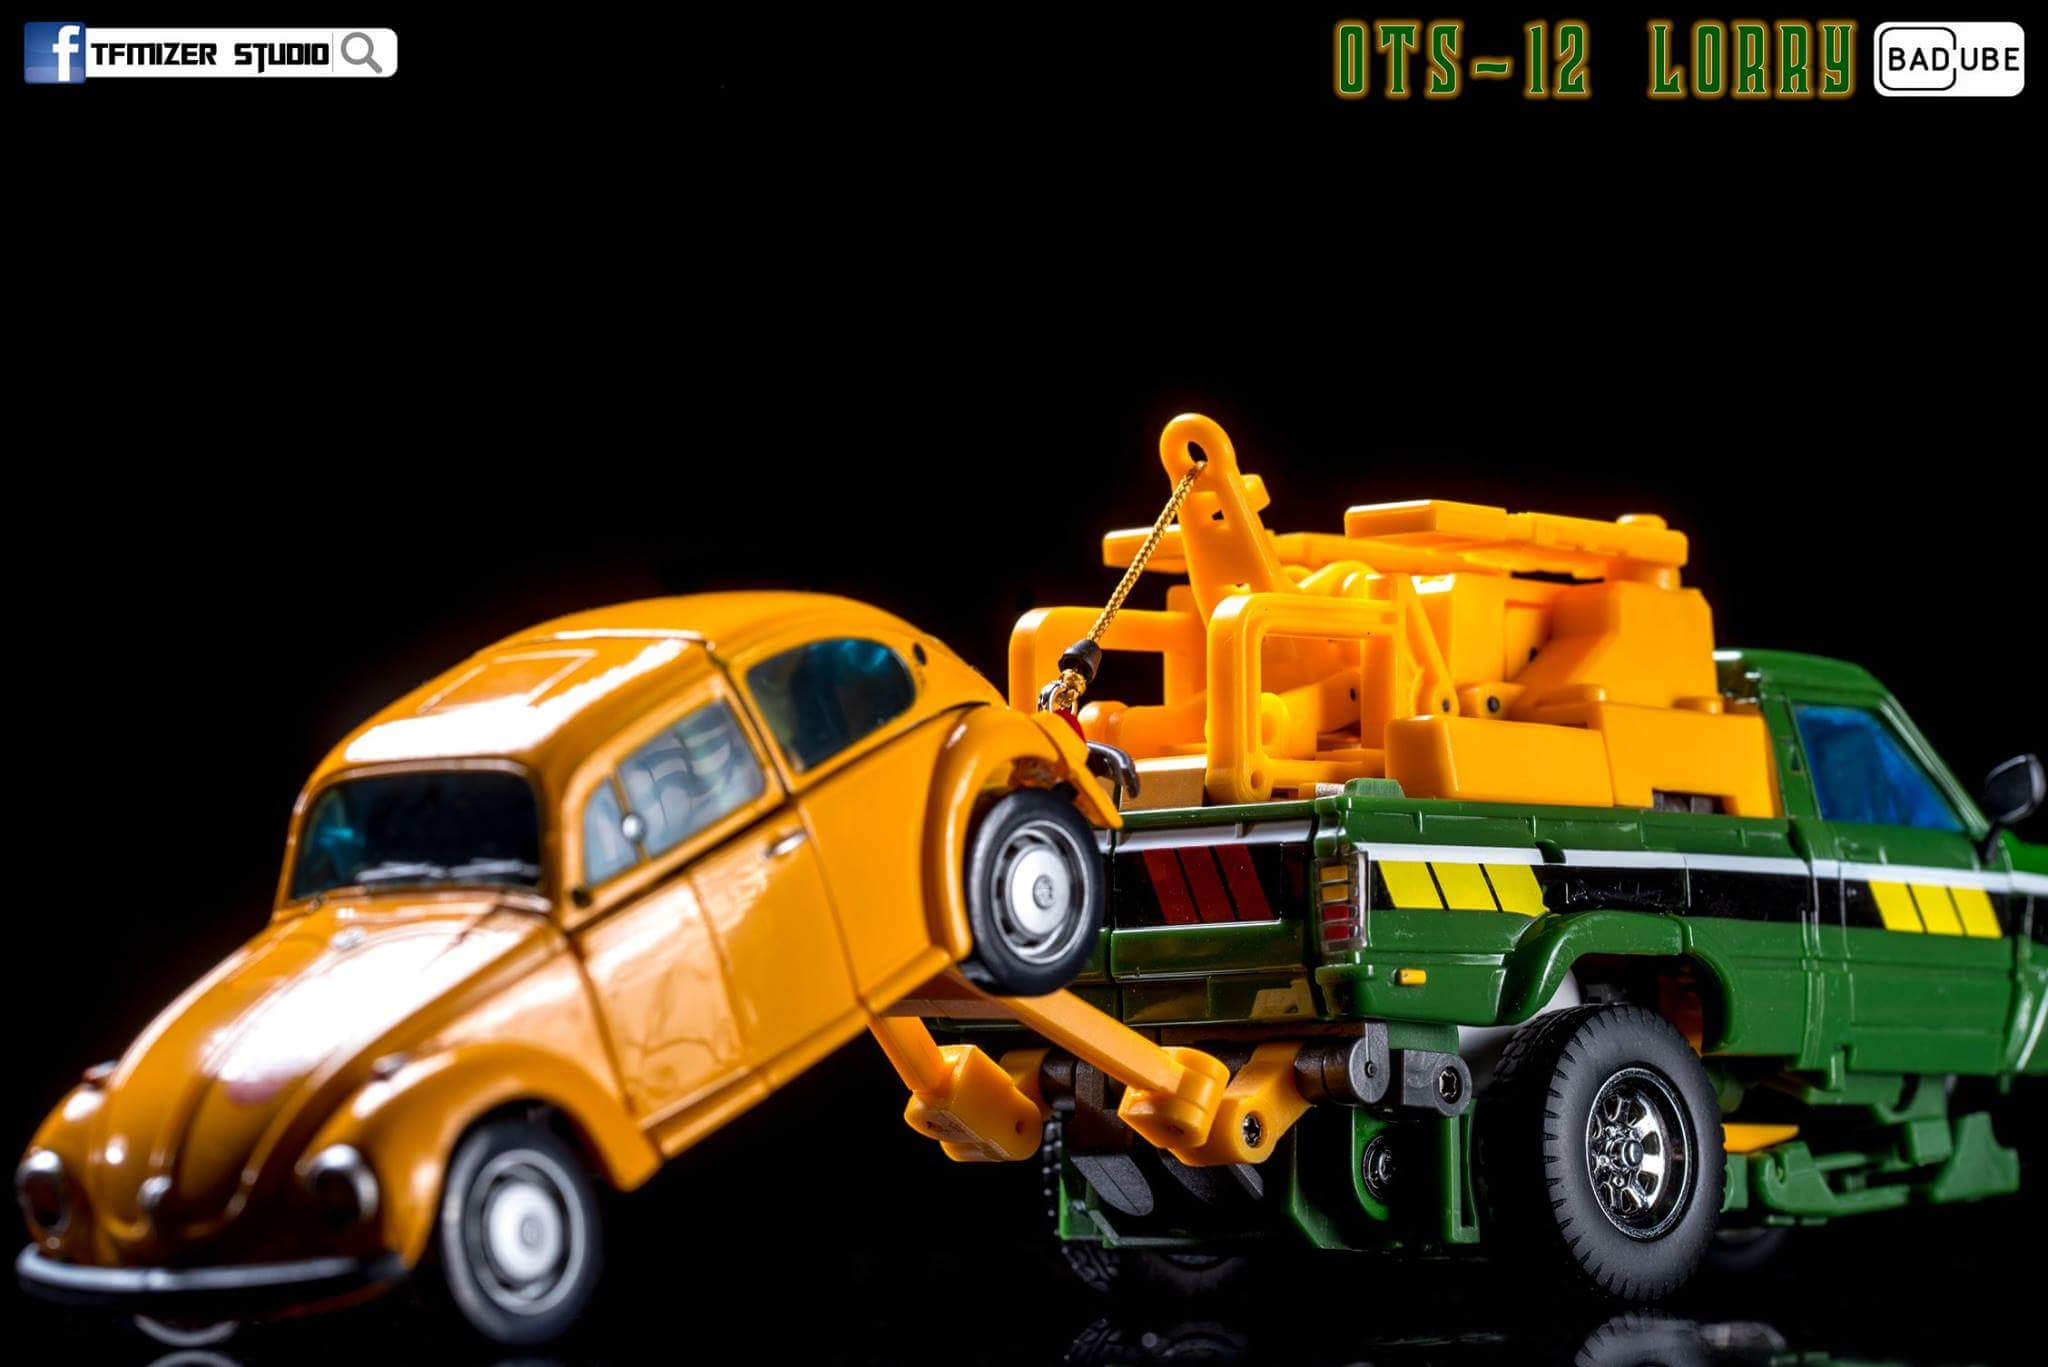 [BadCube] Produit Tiers - Jouet OTS-12 Lorry - aka Hoist/Treuil GUNTYld5